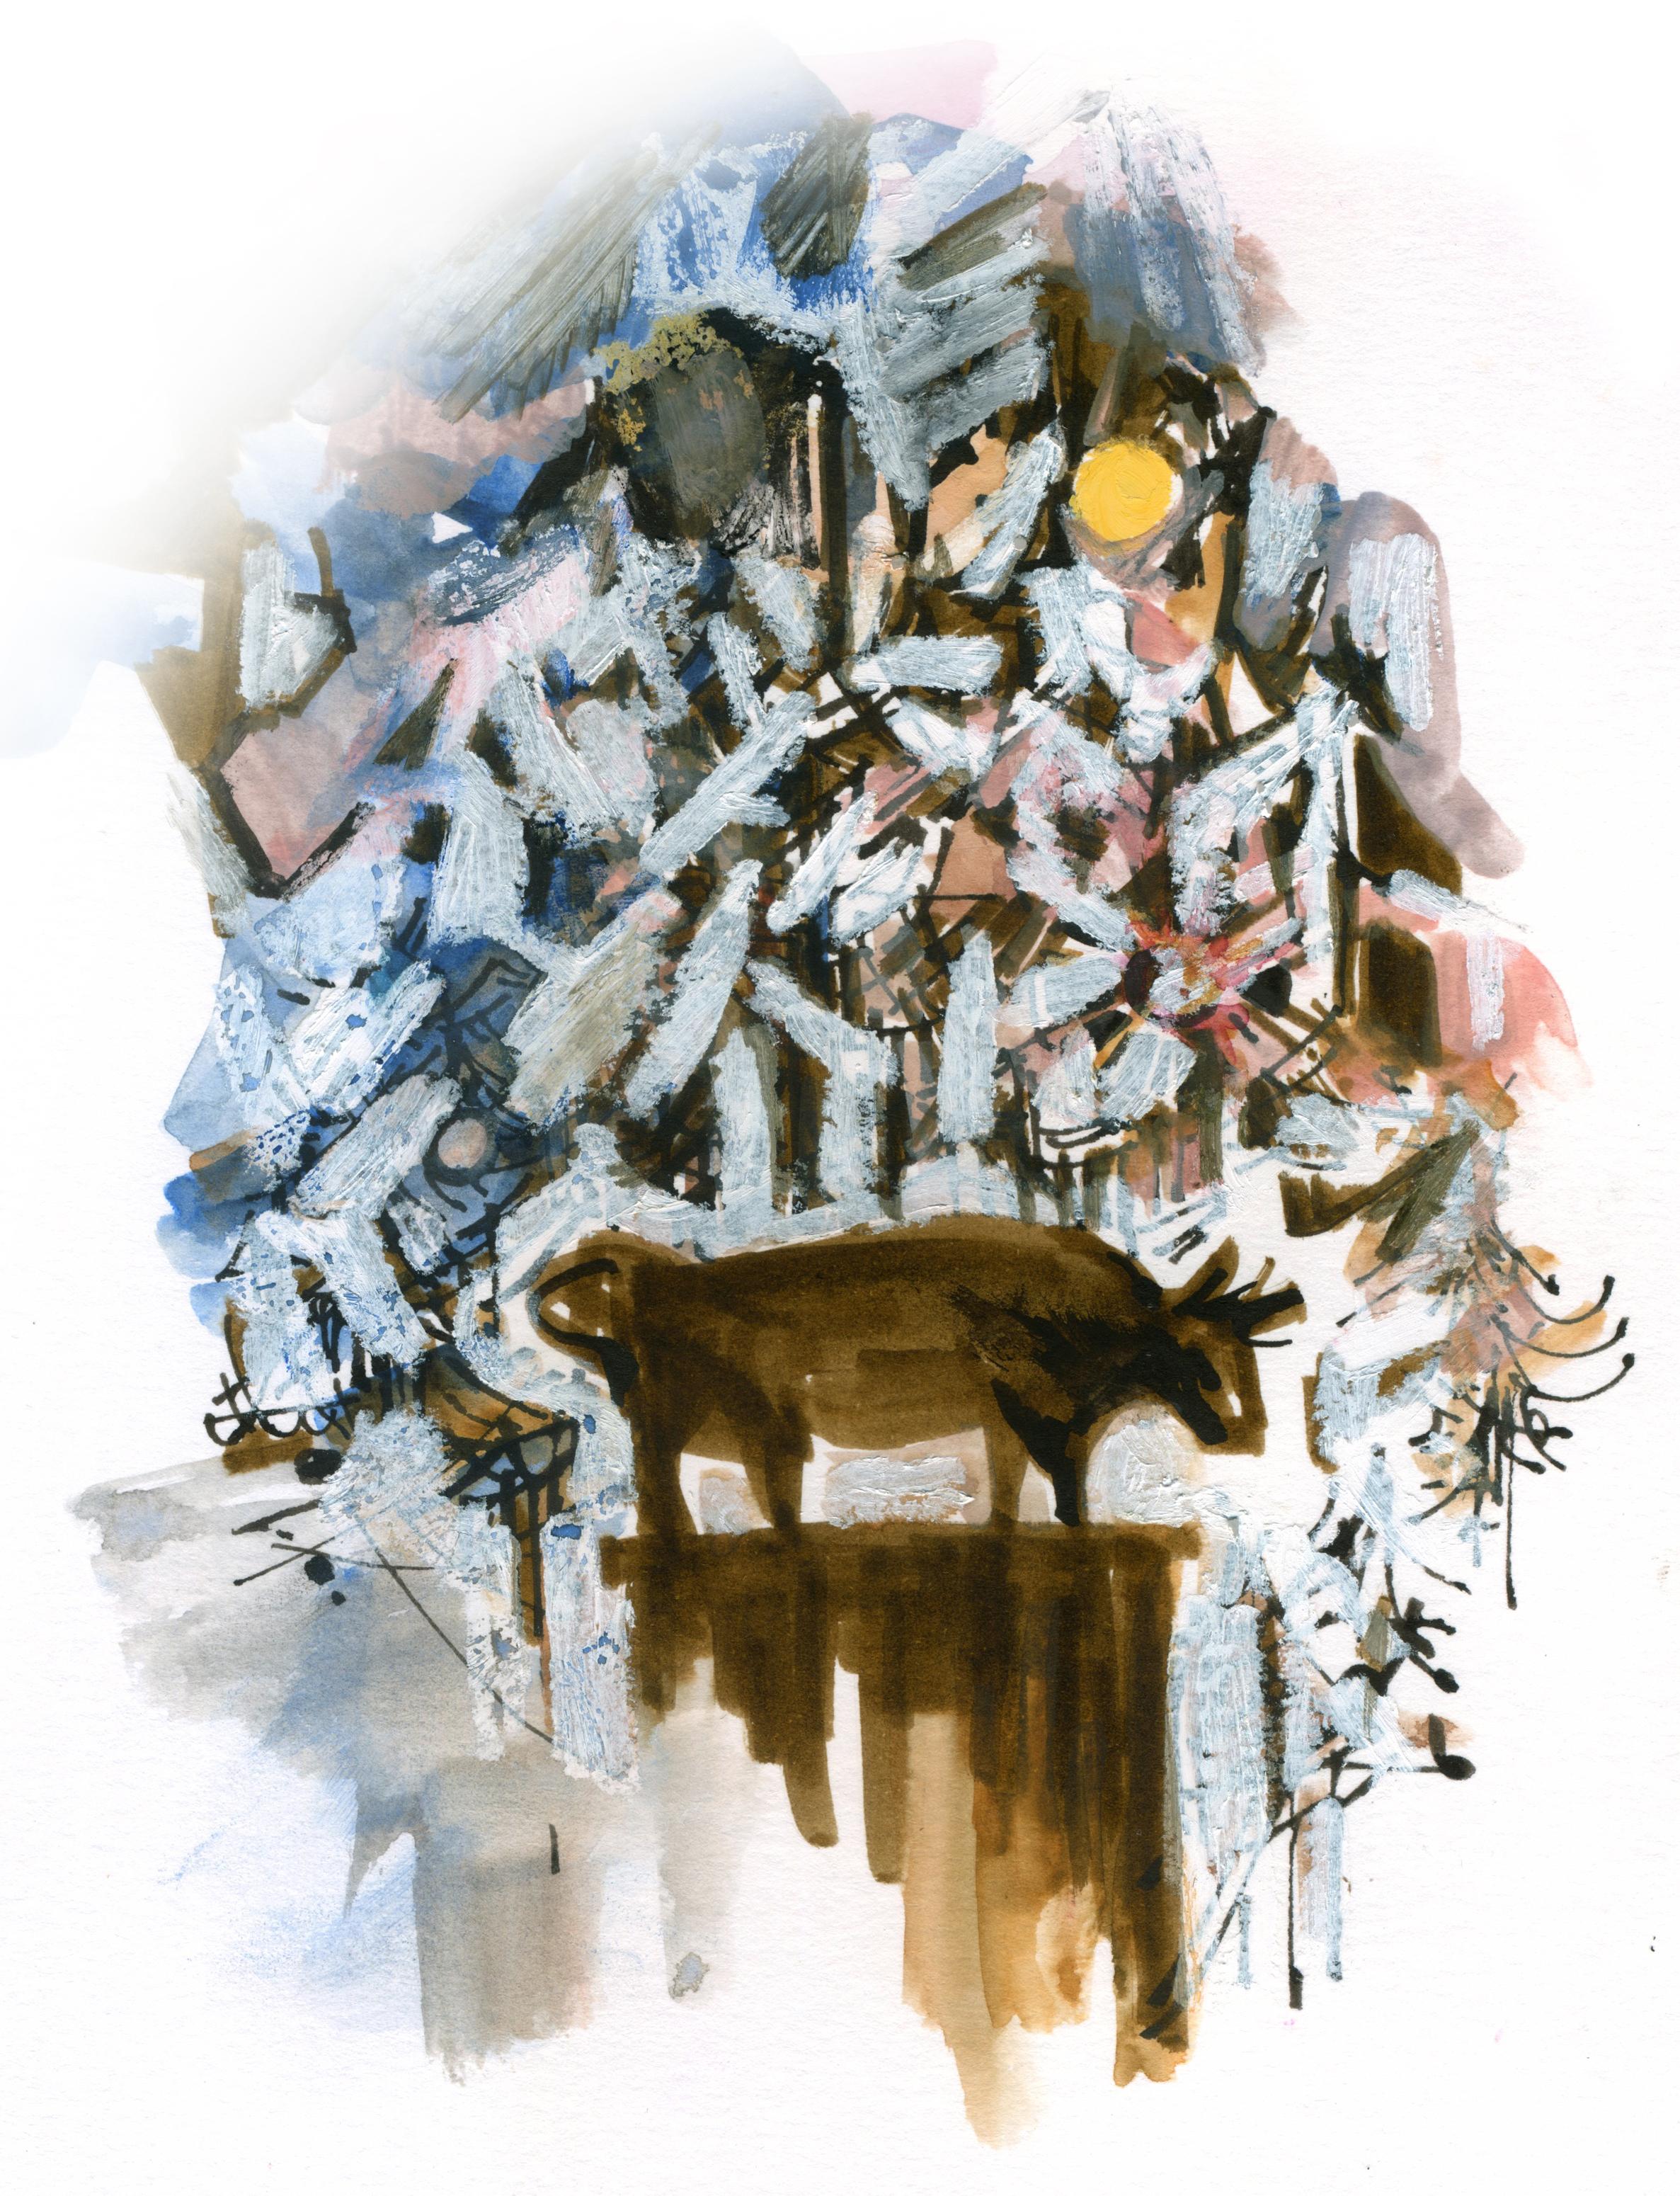 Smithtown Bull  Whisper  monument, Smithtown, NY, Winter 2015